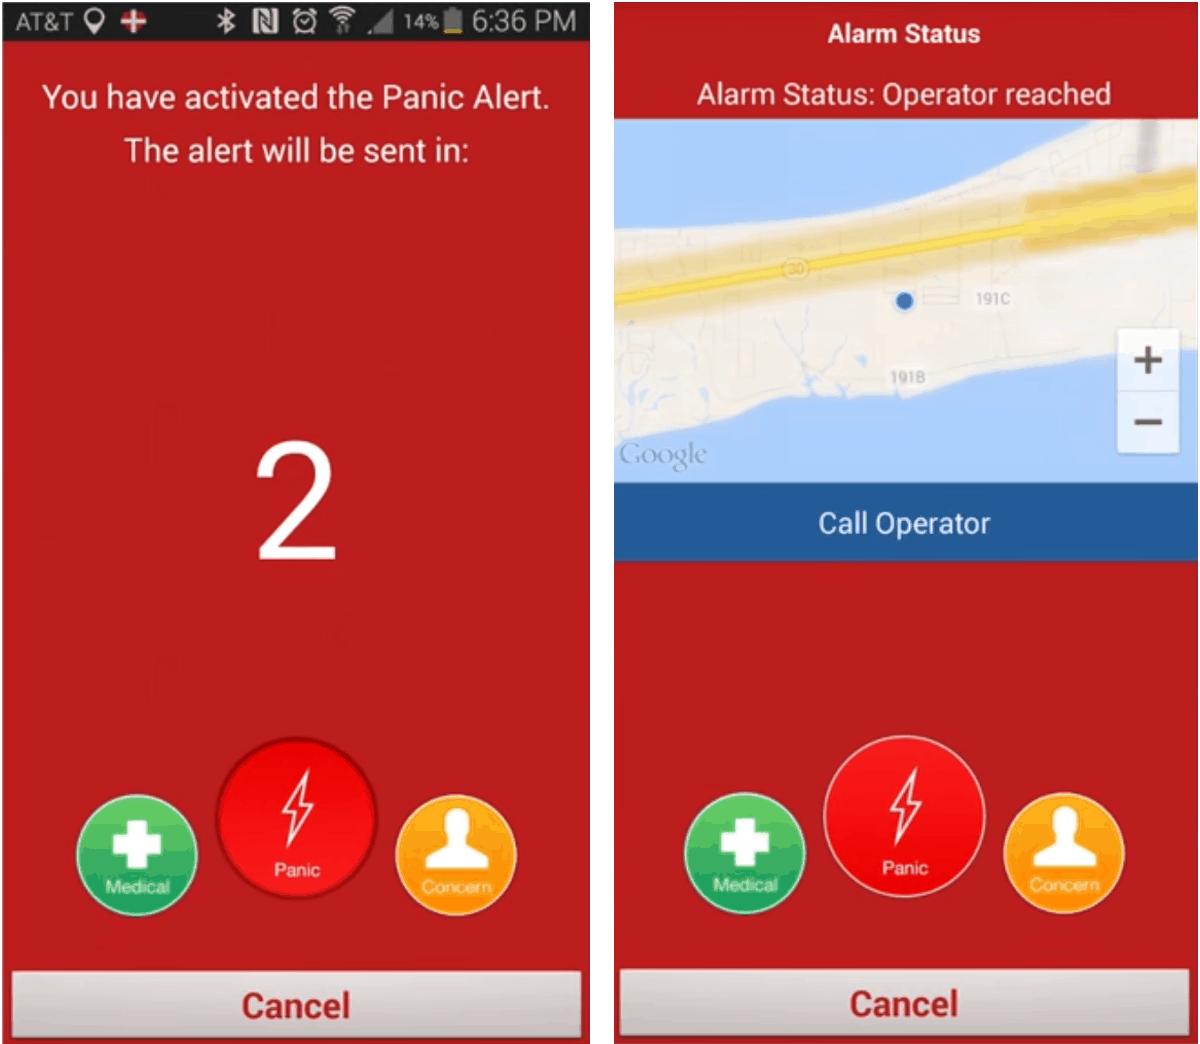 LifeFone Panic Alert Mobile App Screenshots